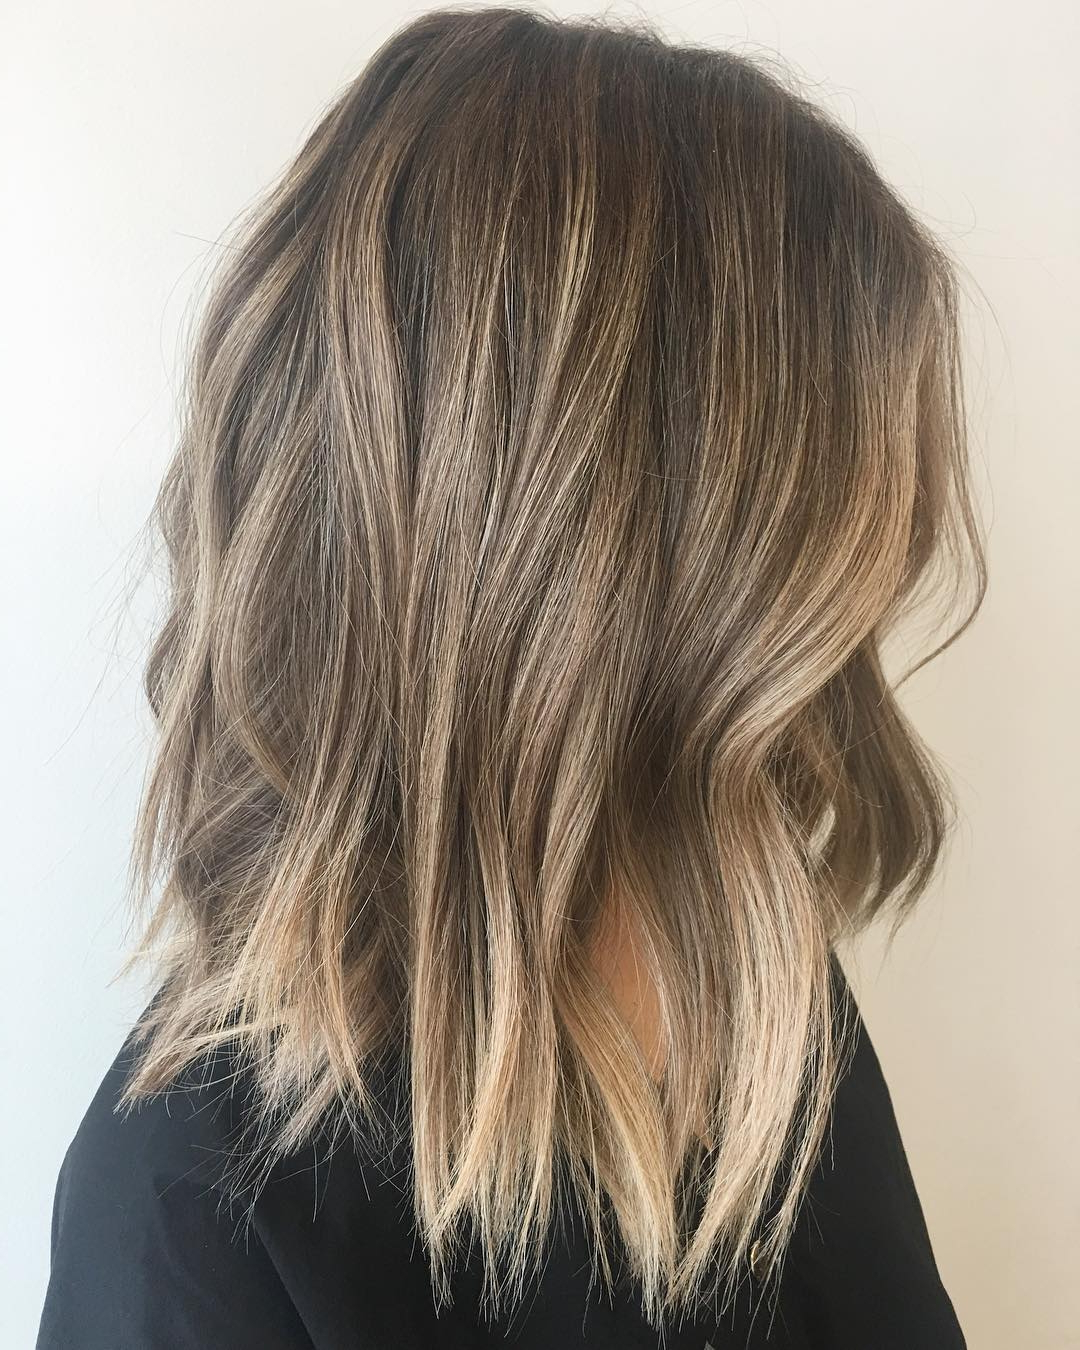 70 Flattering Balayage Hair Color Ideas – Balayage Pertaining To Blonde Balayage Hairstyles (View 18 of 20)